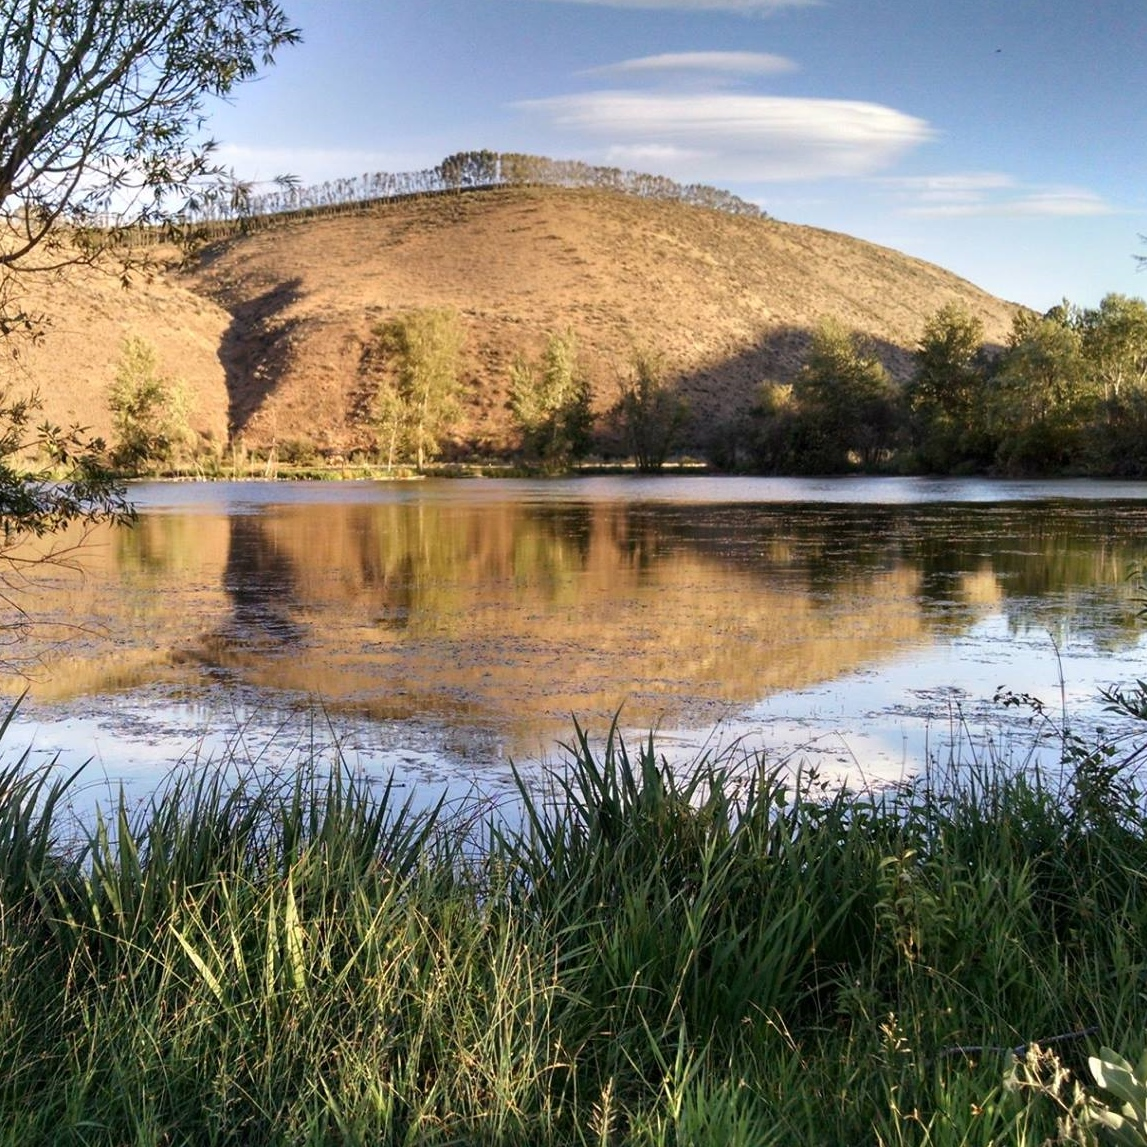 Helen McCabe Park - pond